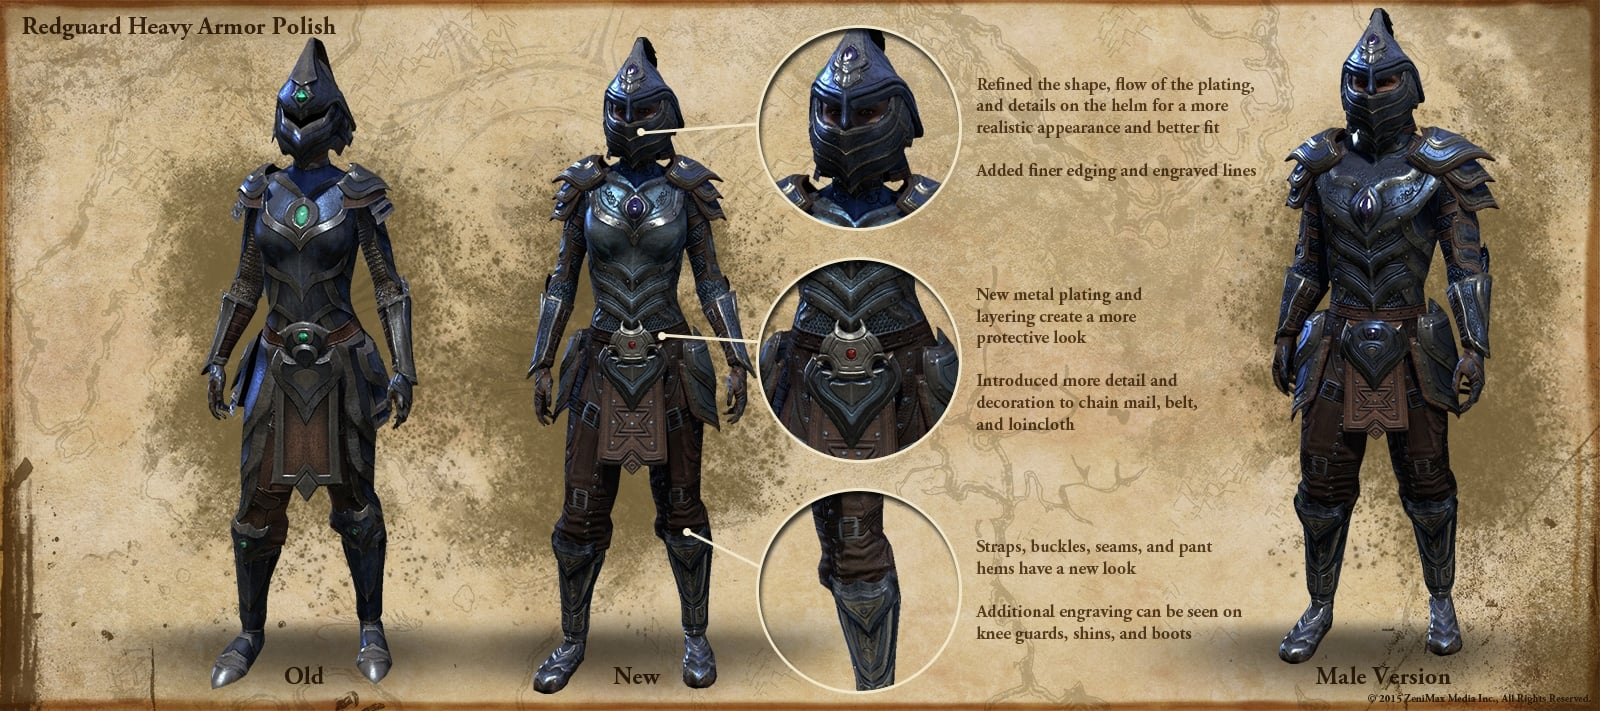 Gotowi na wojnę - Orc oraz Redguard armor - Elder Scrolls ... Elder Scrolls Online Redguard Names